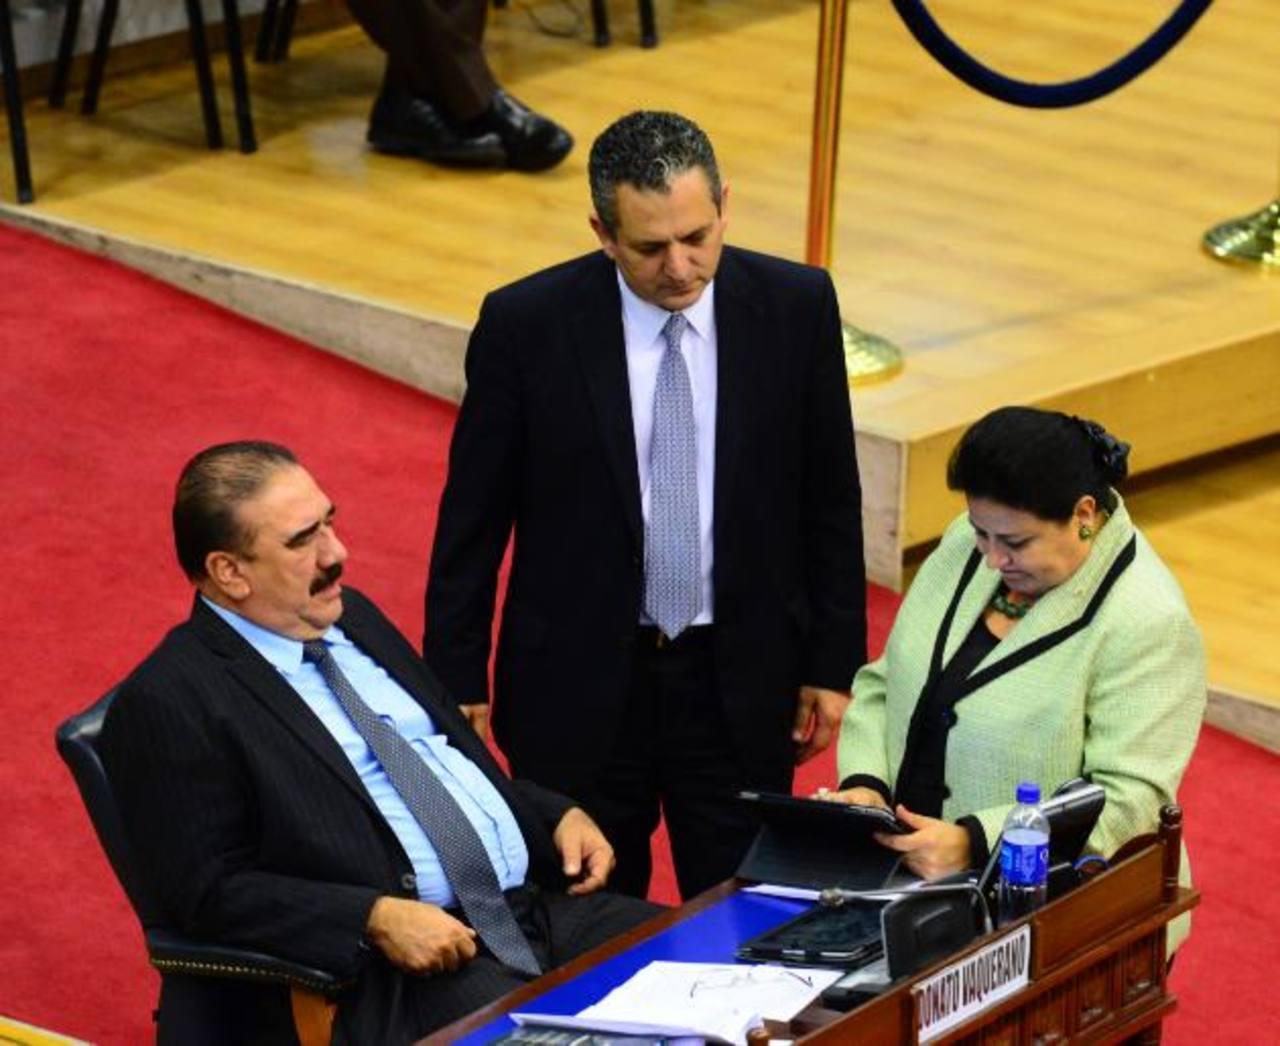 Diputados de ARENA Donato Vaquerano (jefe de bancada), Edwin Zamora y Margarita Escobar. foto edh / ARCHIVO